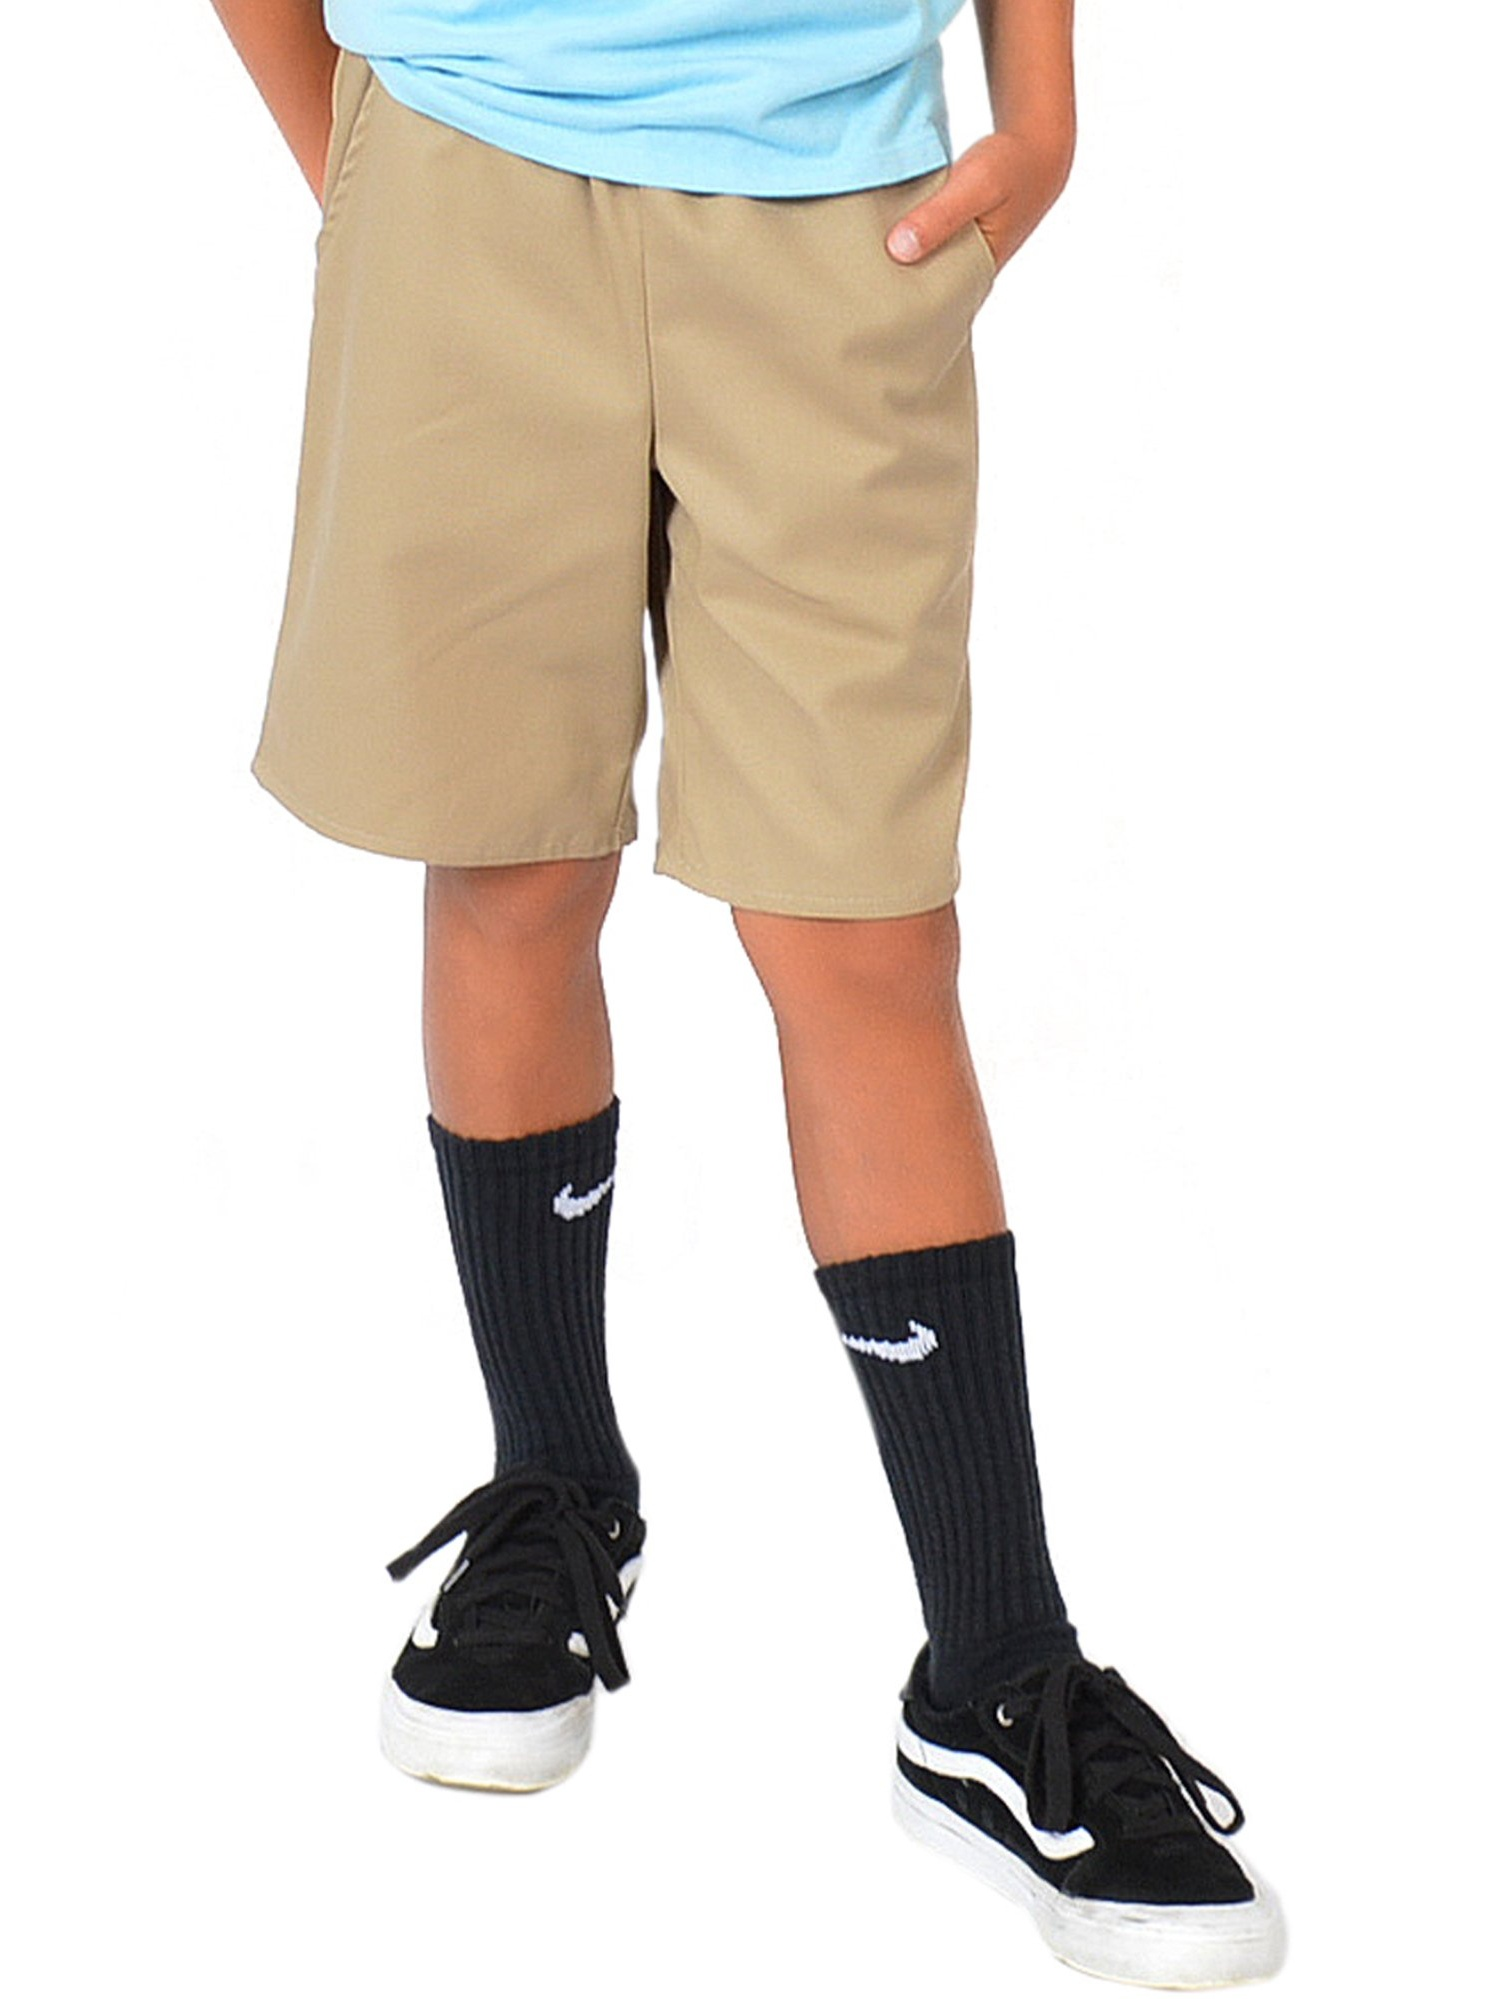 Boy's Uniform Shorts - Navy Blue / X-Small (4)